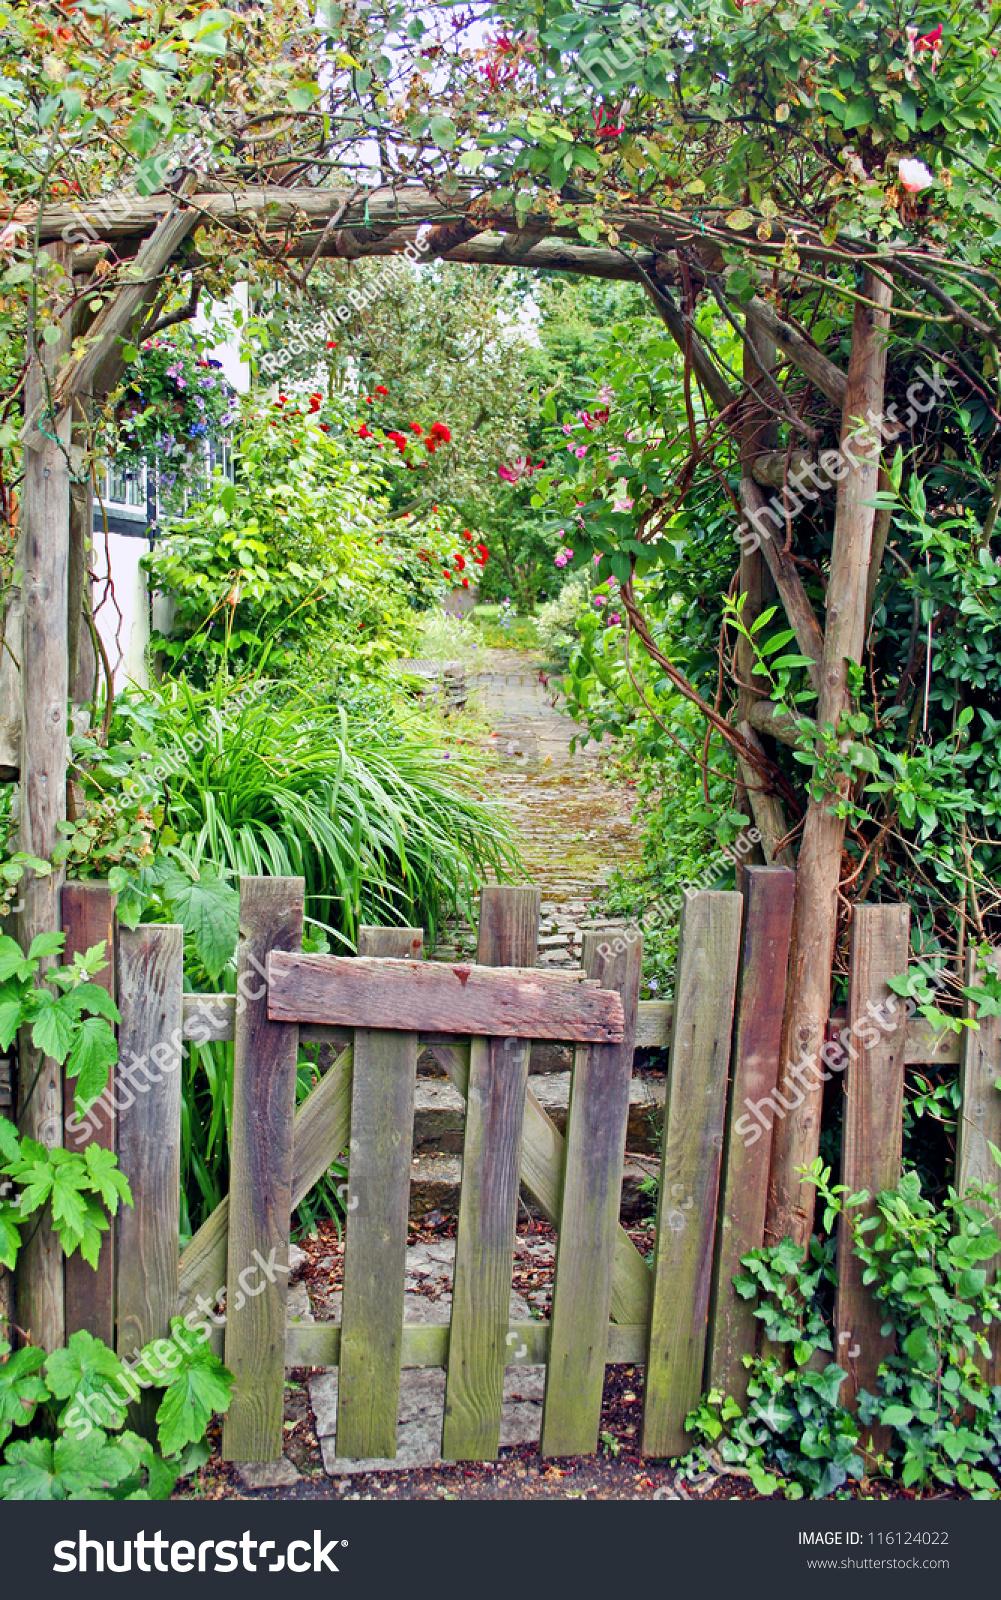 Delightful Rustic Garden Gate